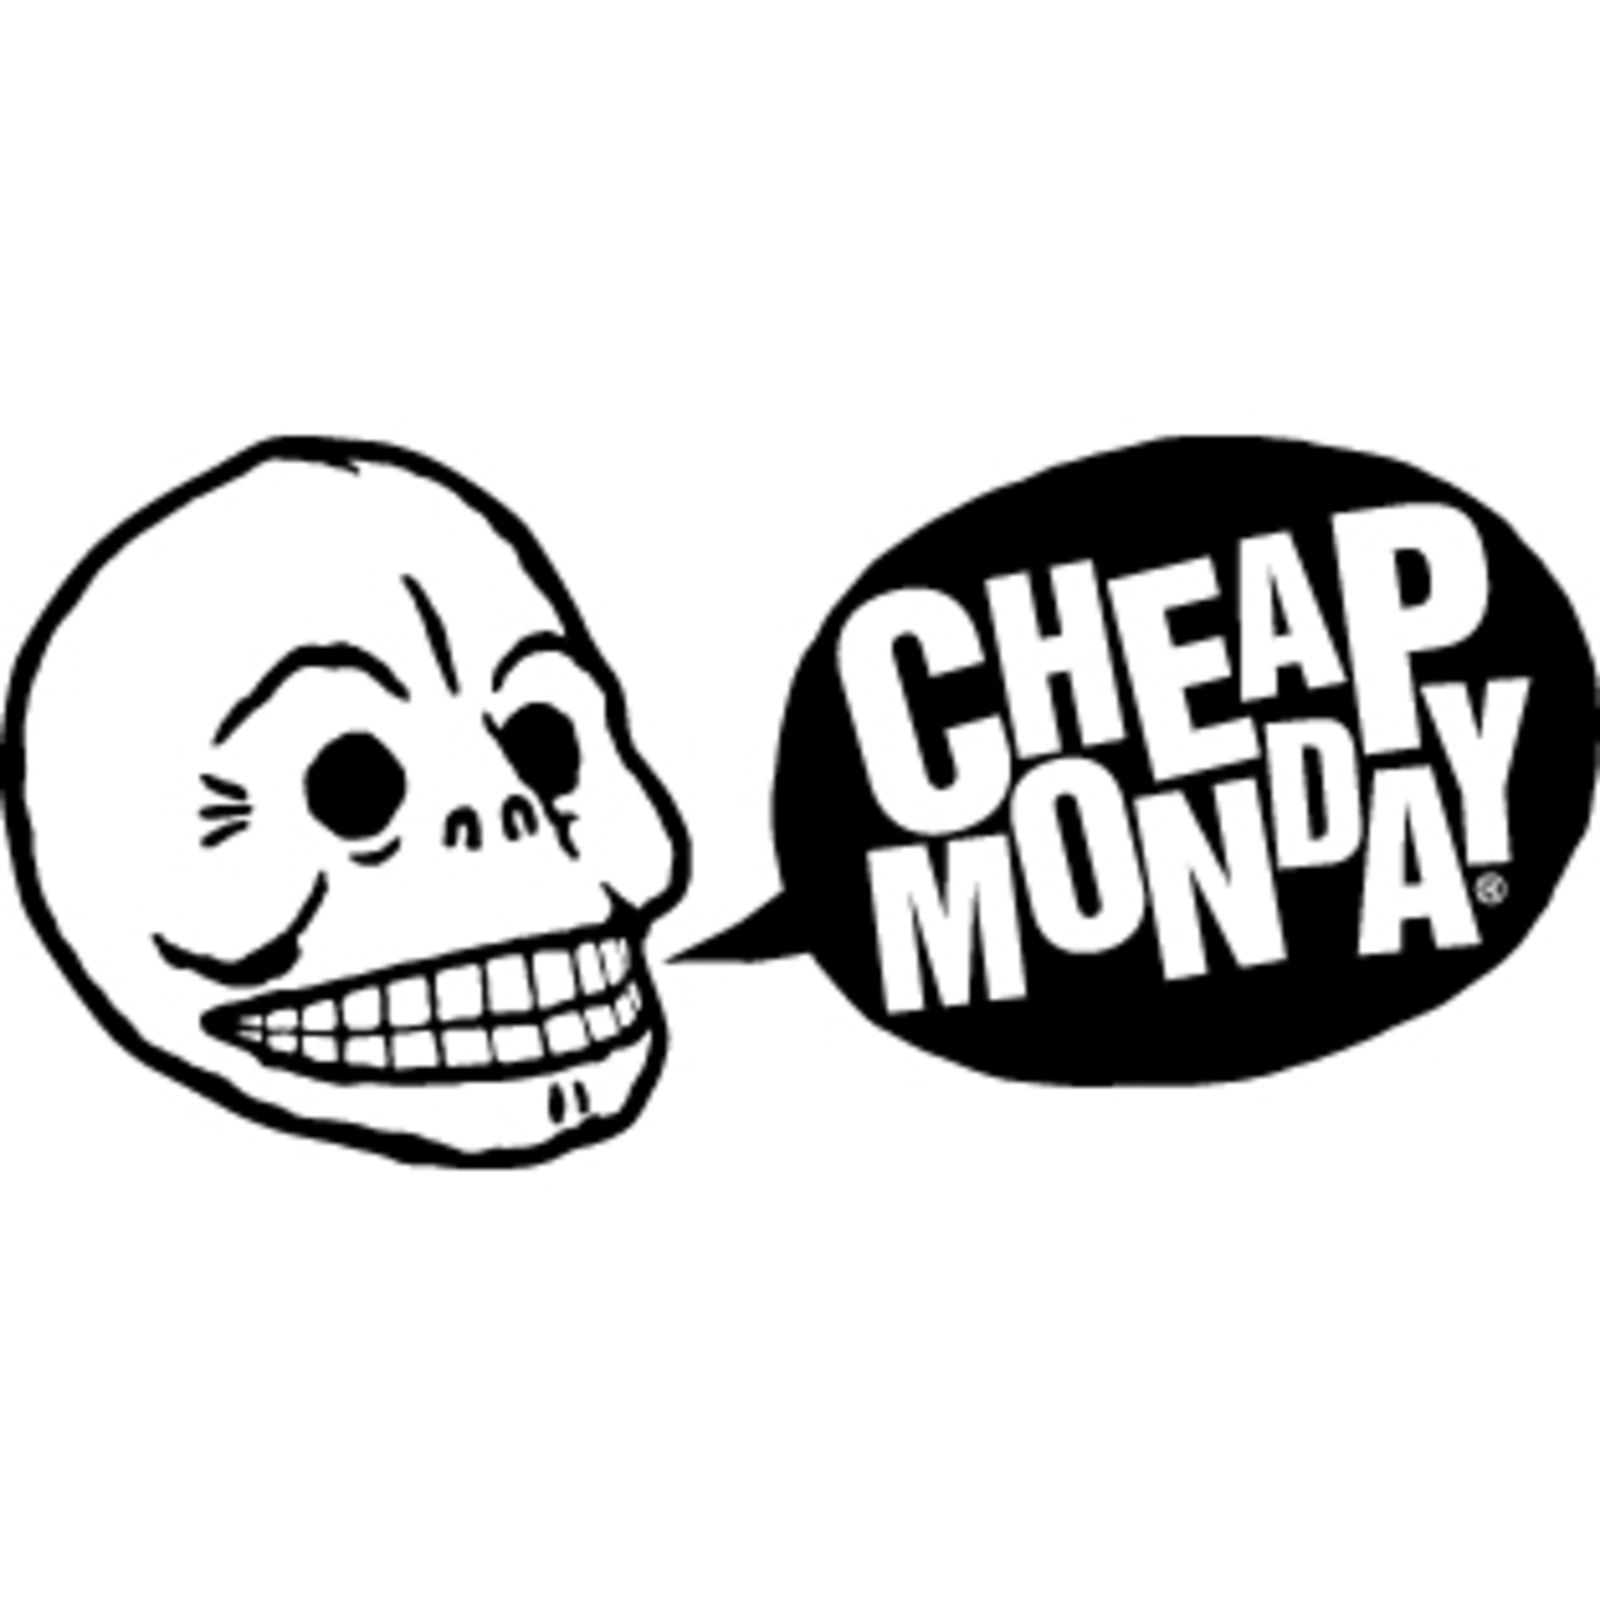 CHEAP MONDAY (Bild 1)